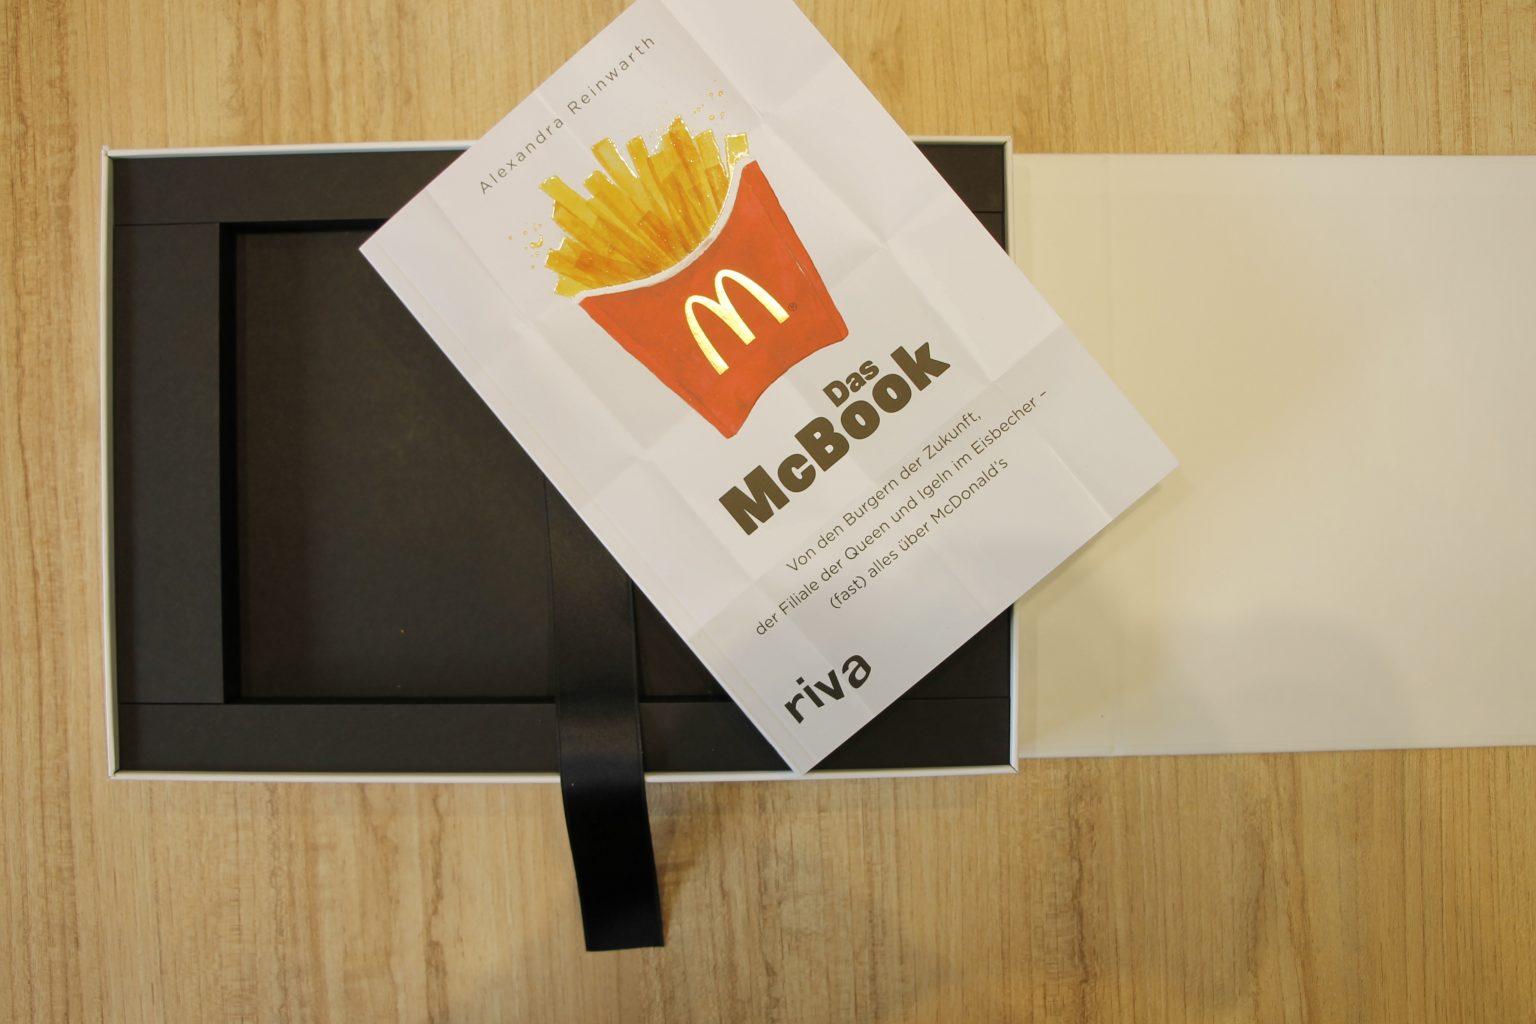 McBook McDonalds Mythen Auflösung